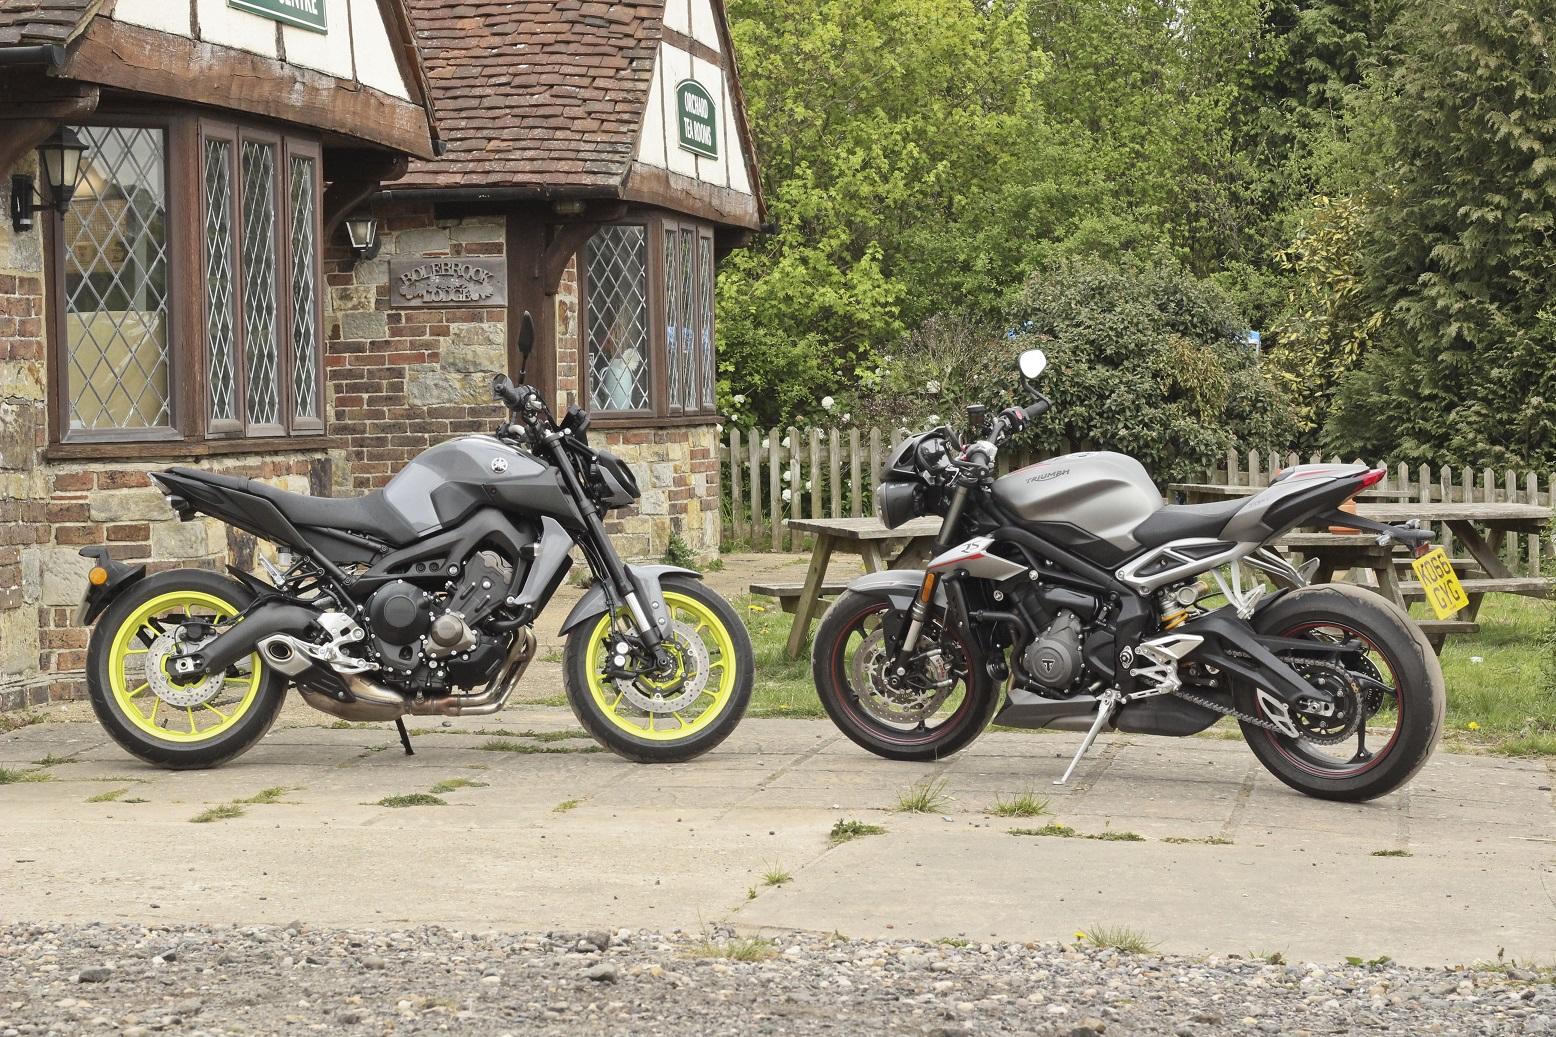 Triumph Street Triple 765 RS and Yamaha MT-09